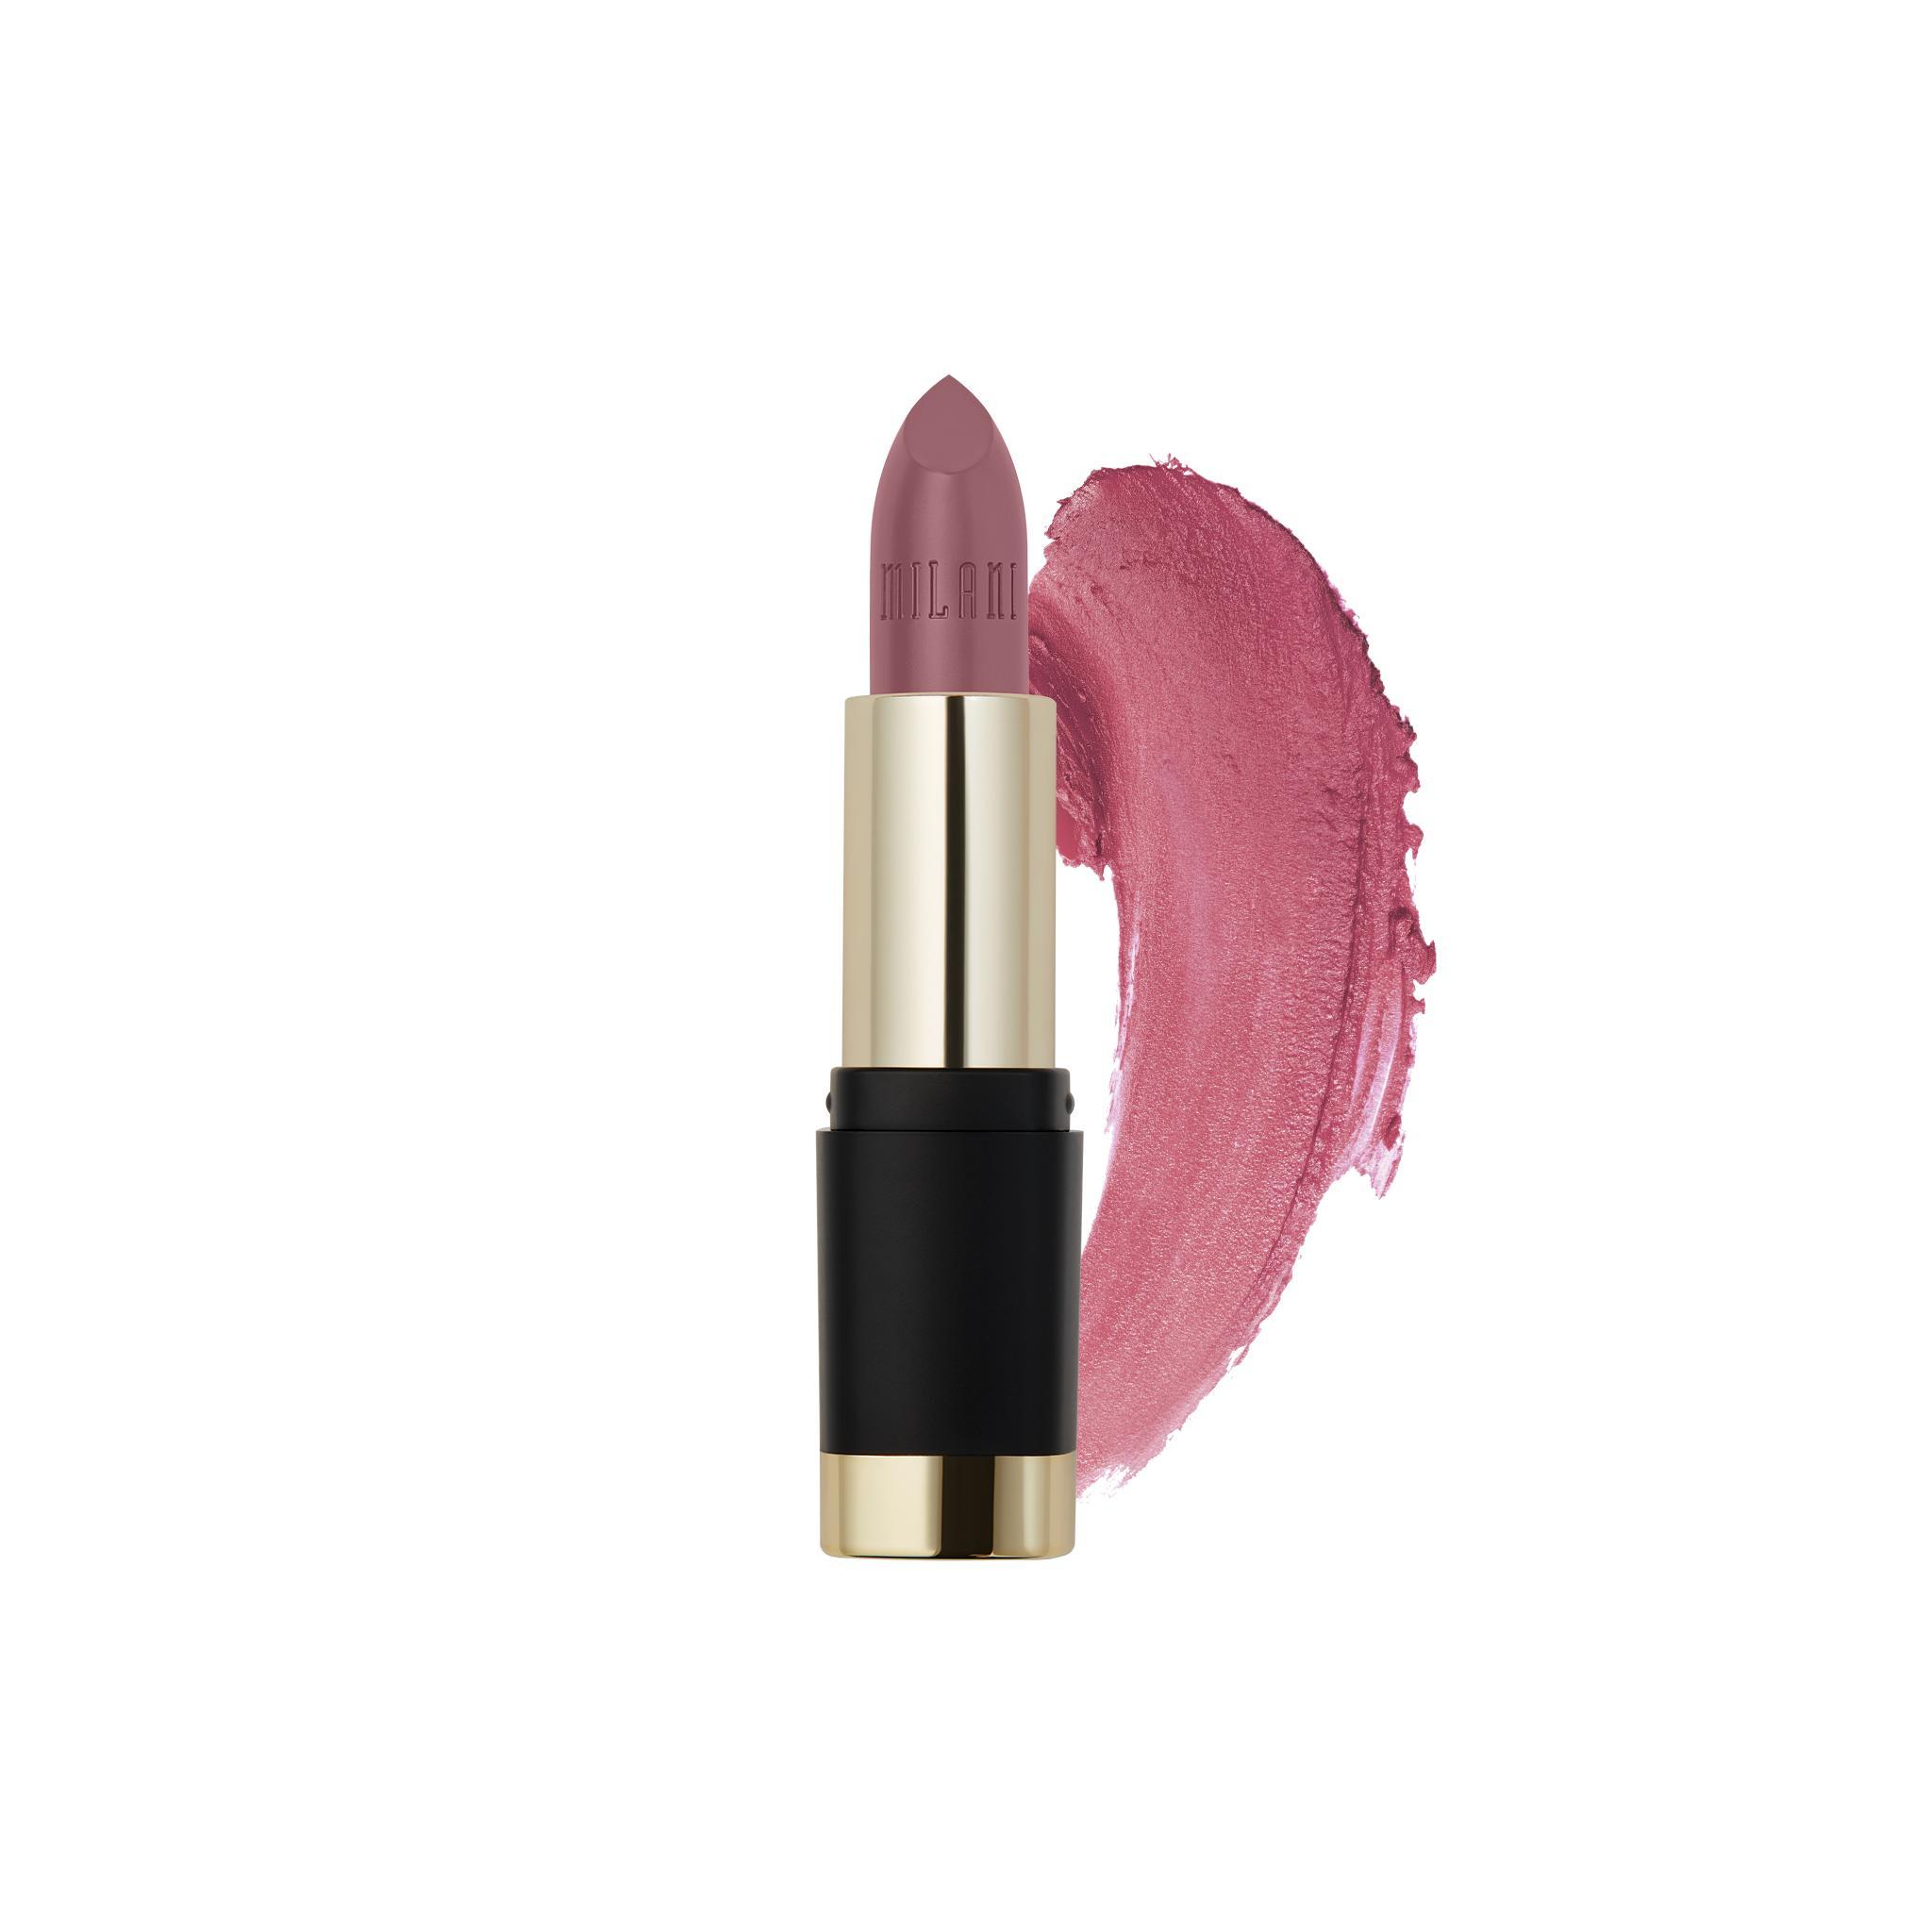 Milani Bold Color Statement Matte Lipstick - 01 I Am Fabulous